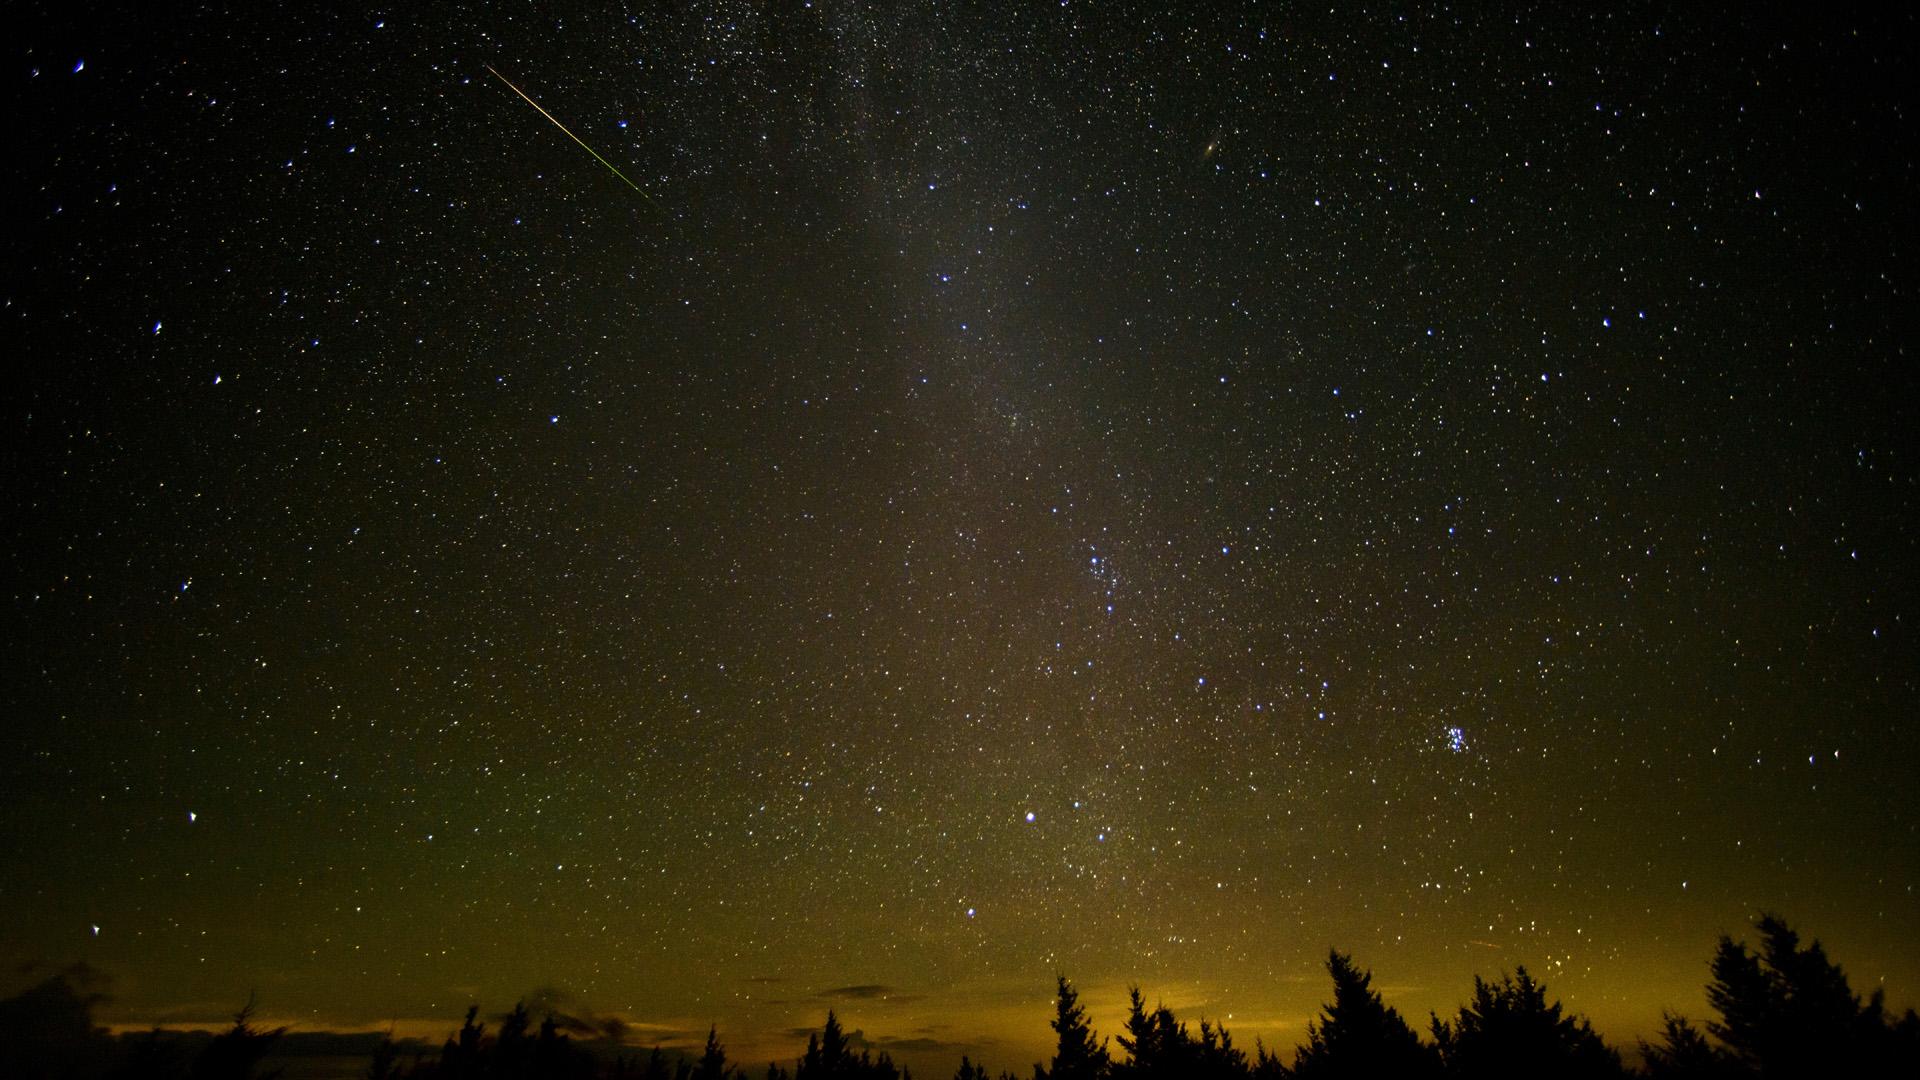 Meteor shower, stars, night sky, Perseid in Spruce Knob, West Virginia86428890-159532